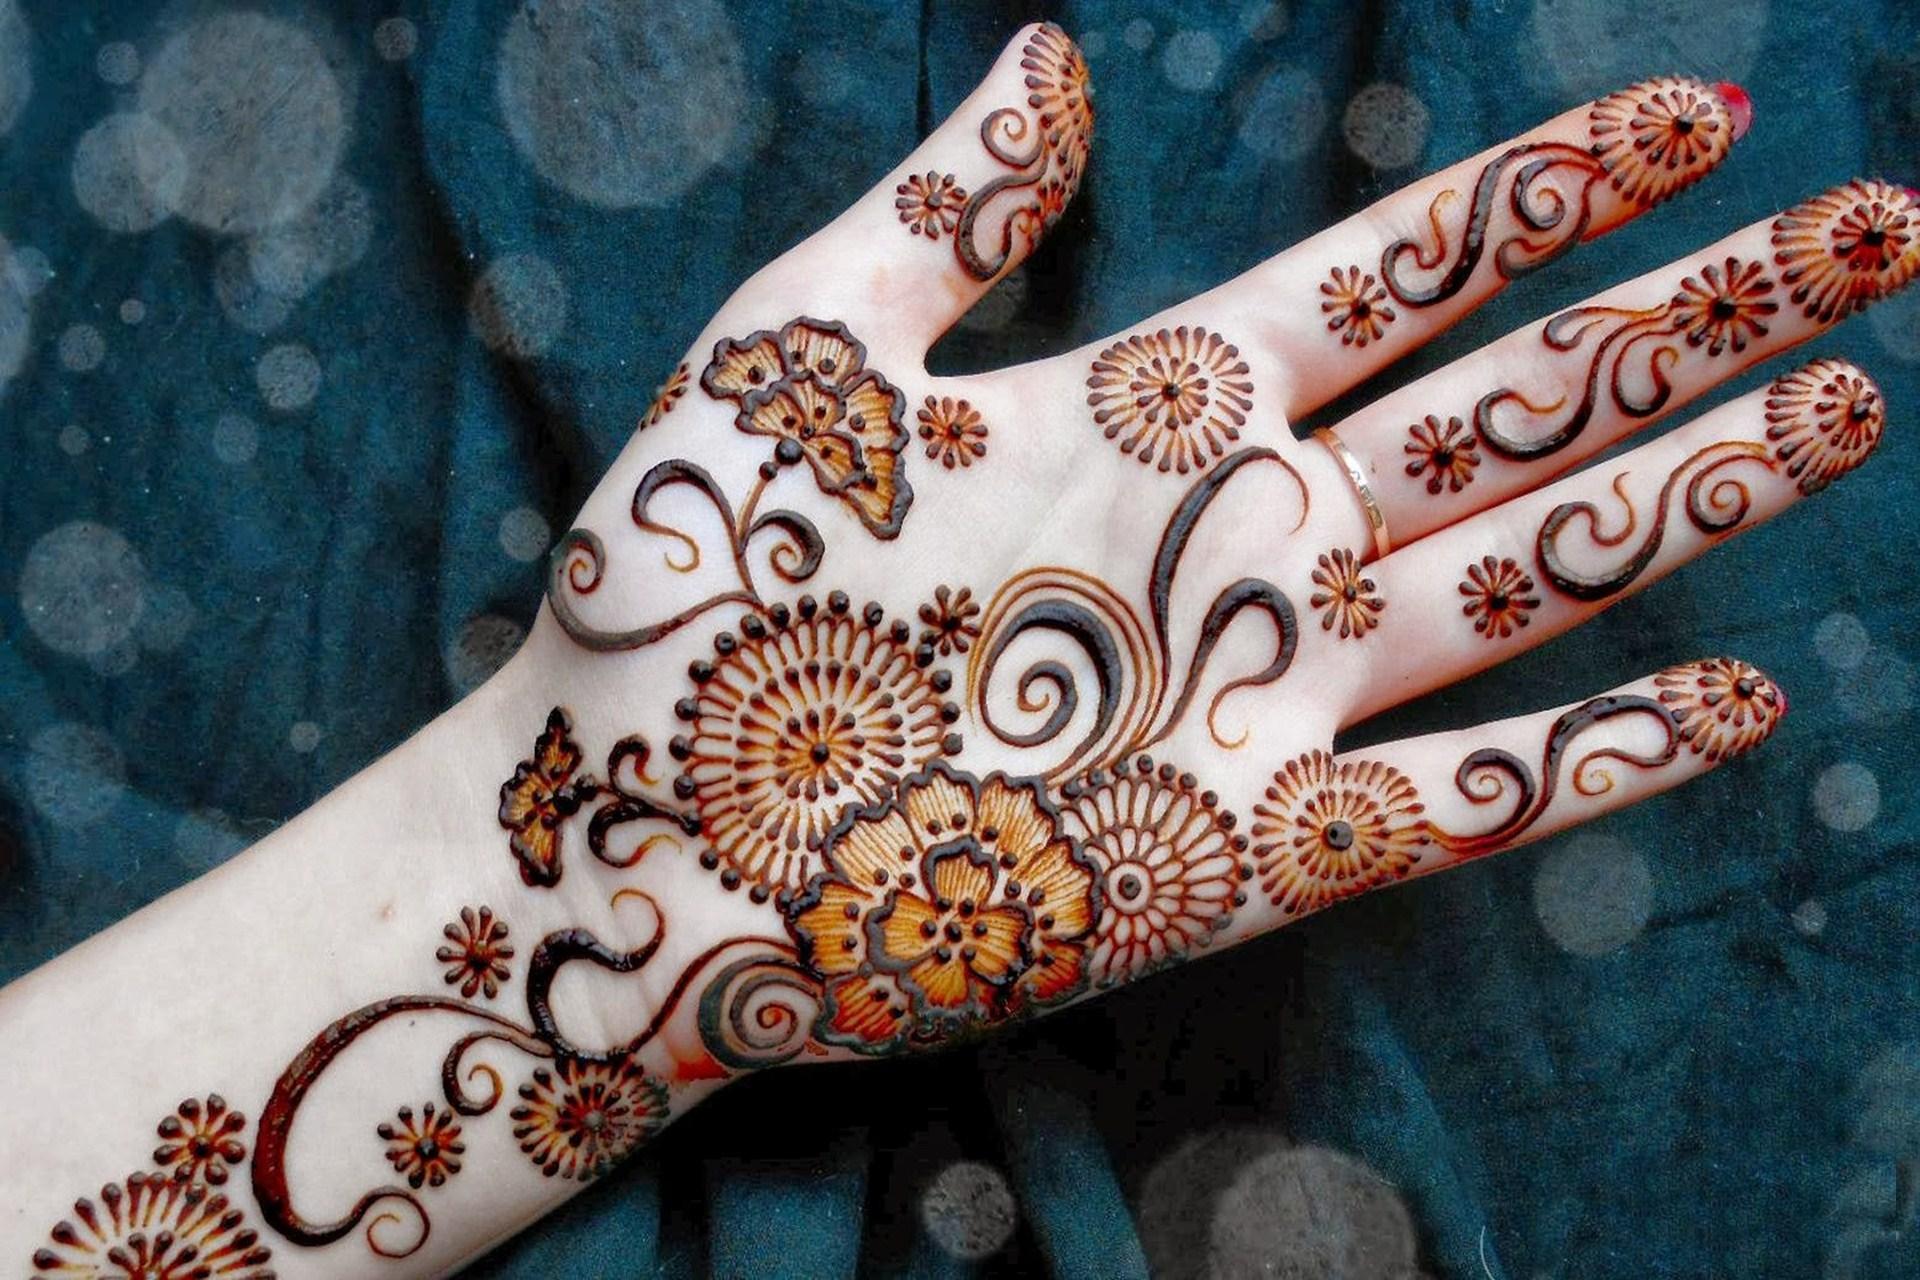 Mehndi design 2017 easy - Special Karva Chauth Simple Easy Mehndi Design